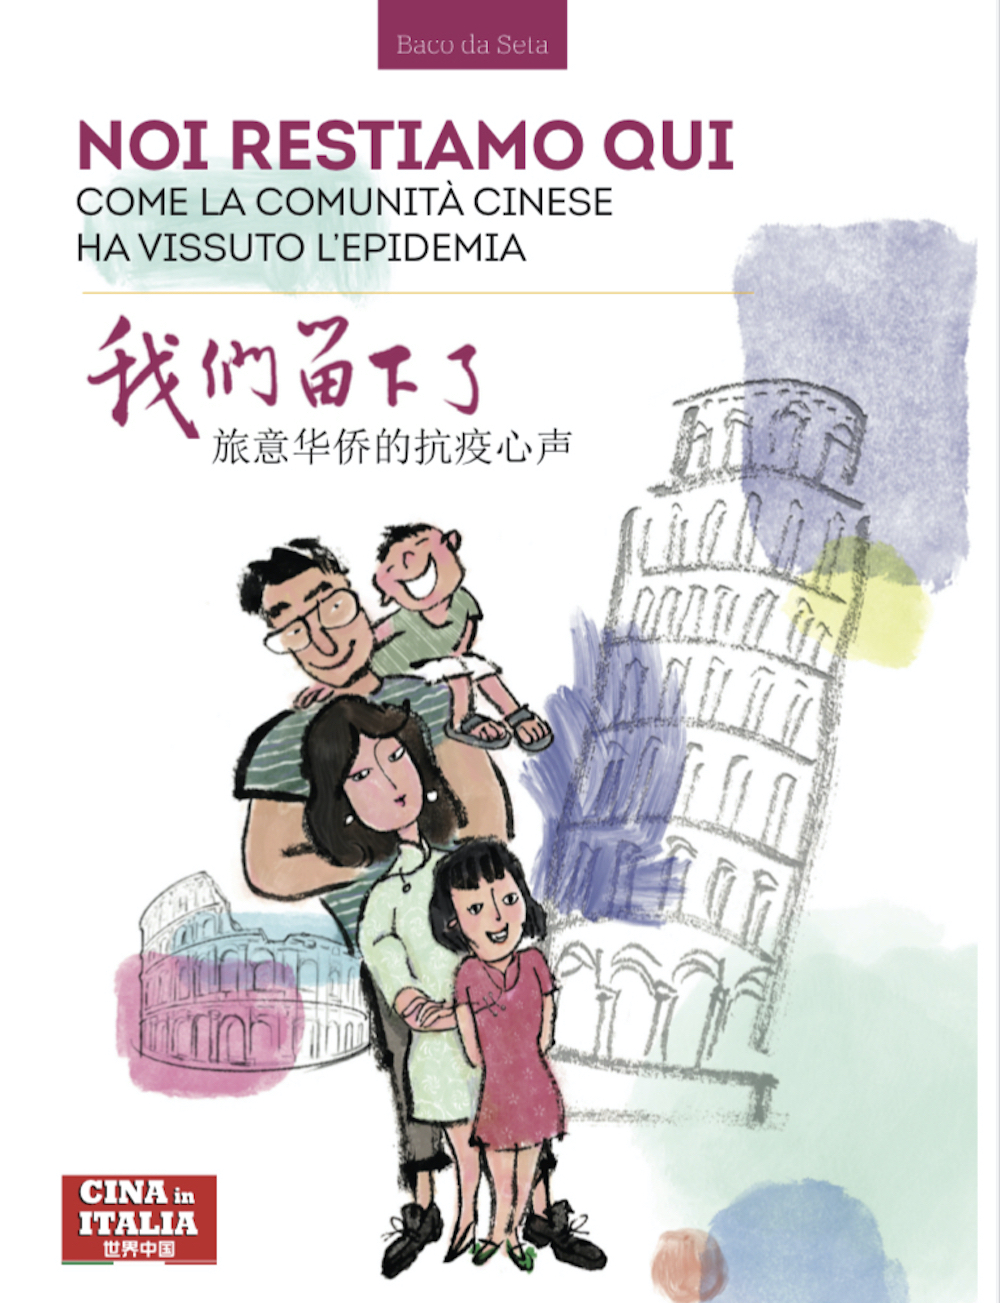 comunità cinese coronavirus